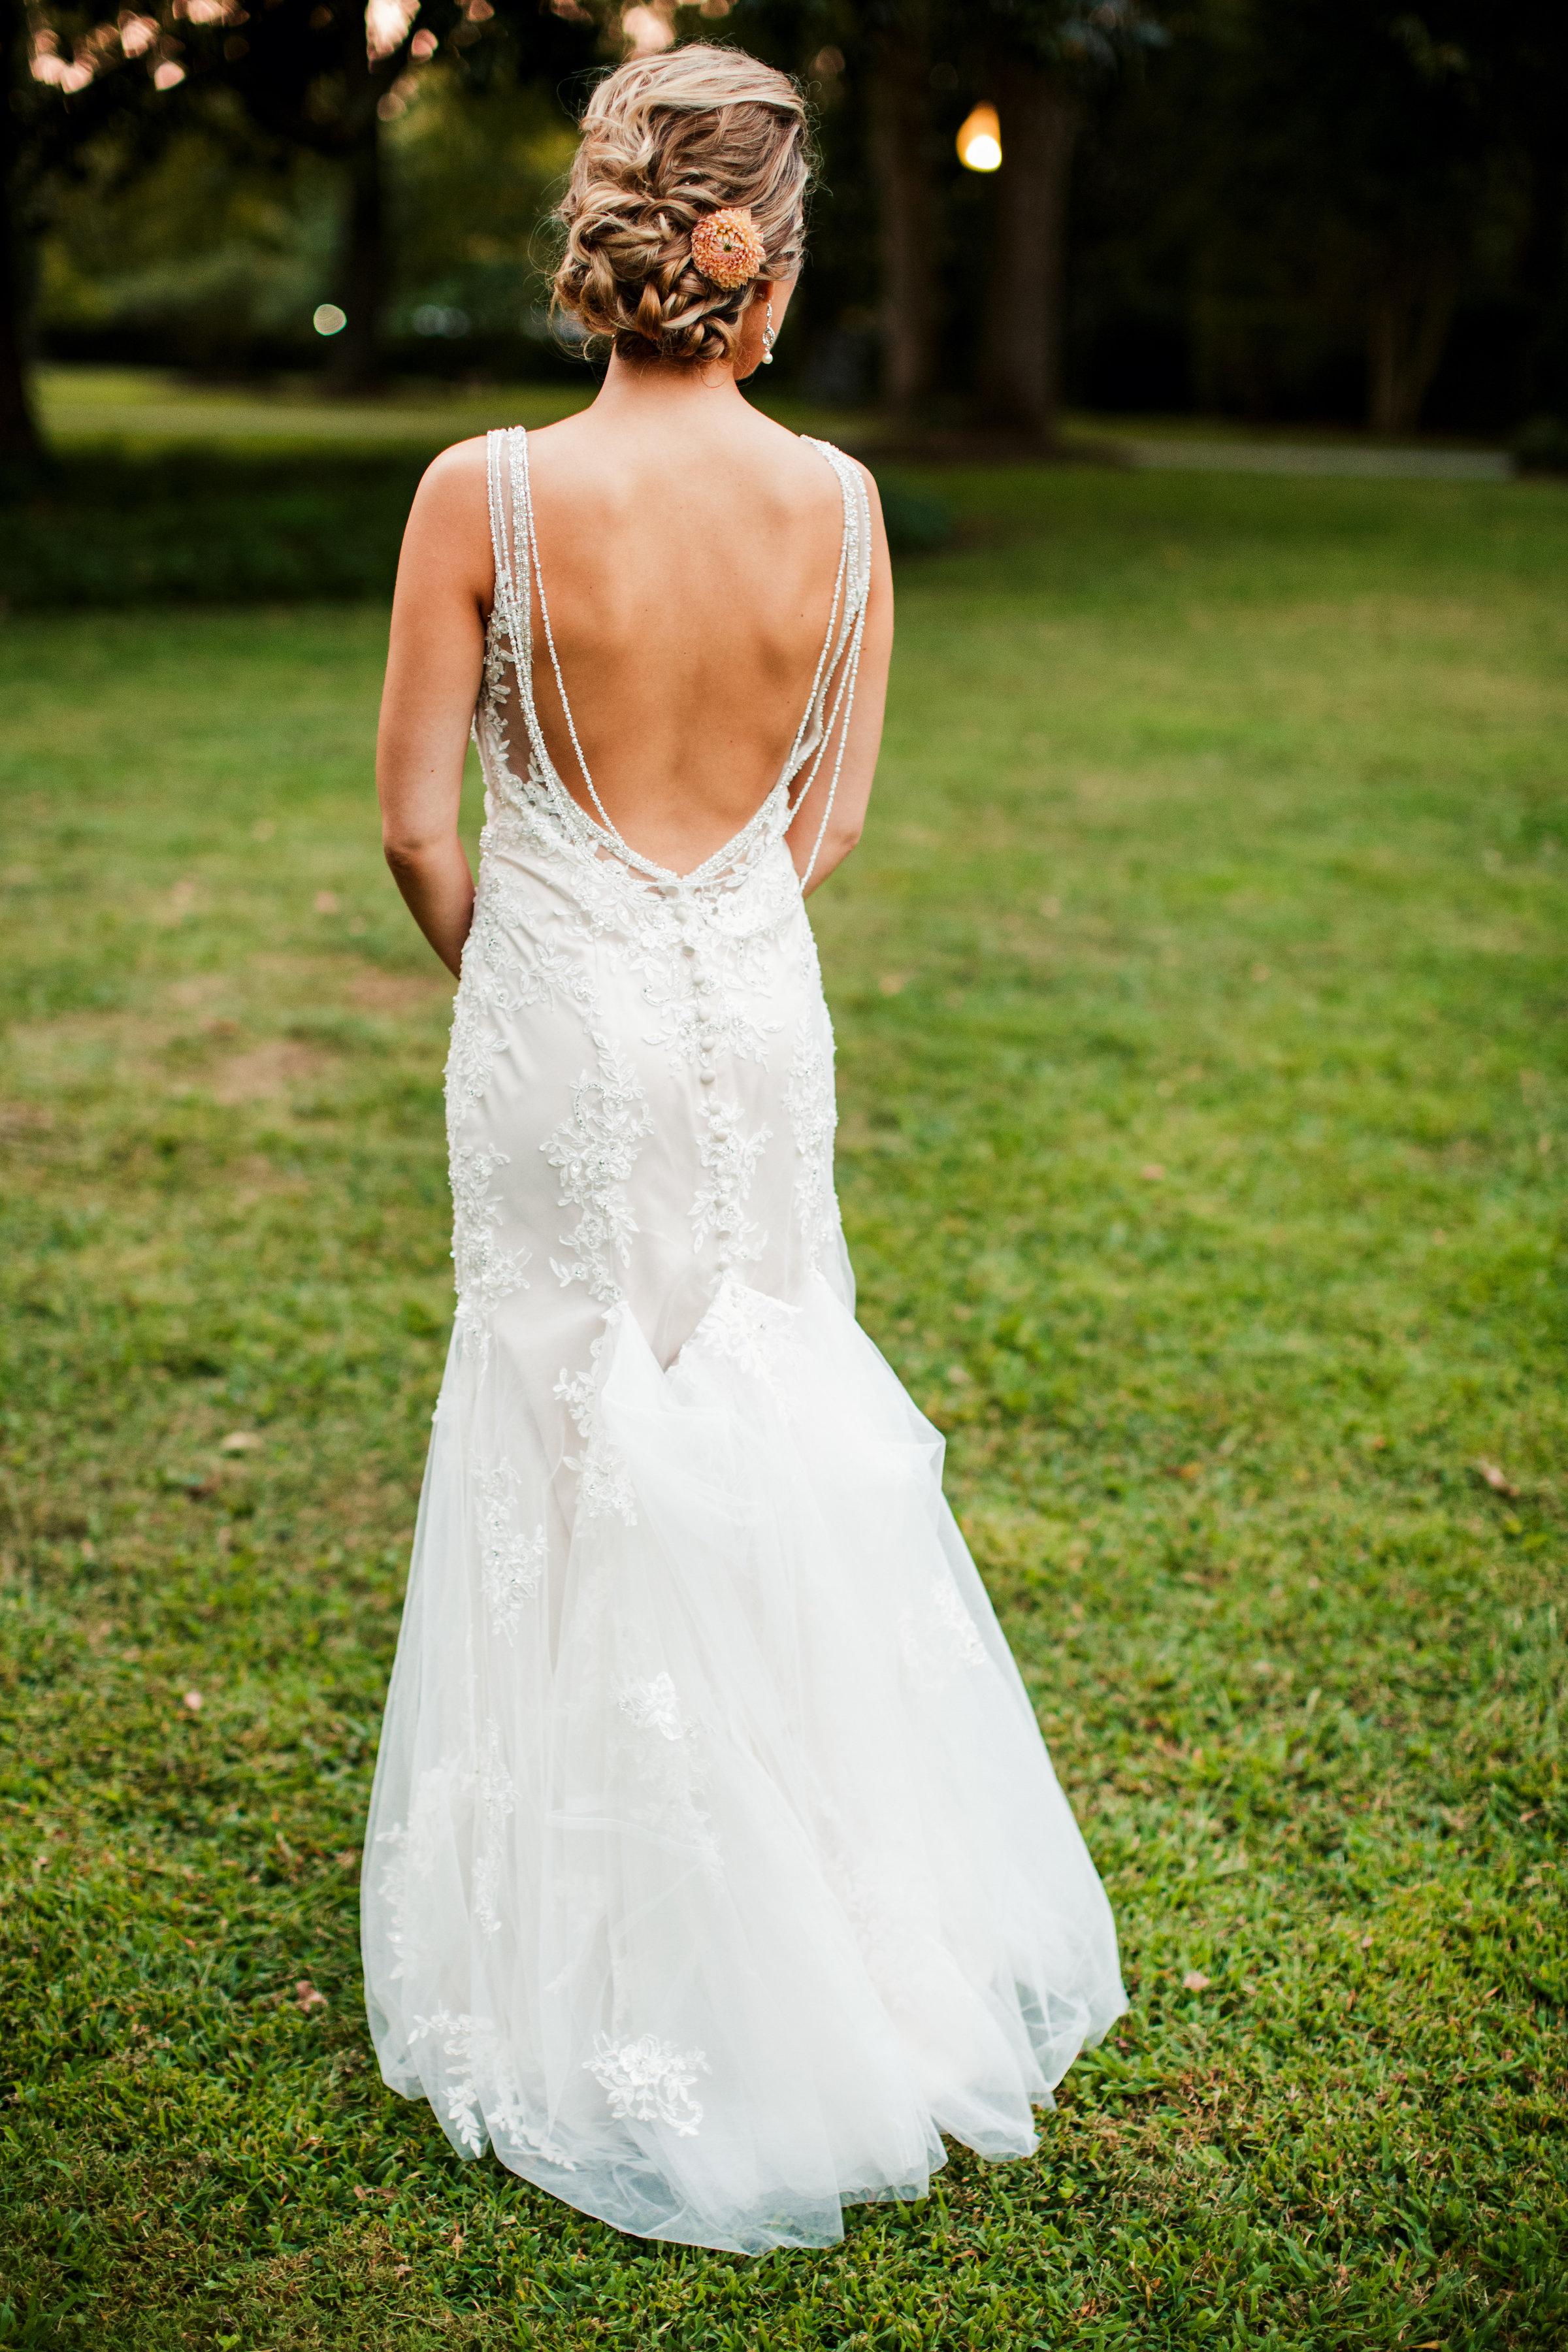 Riverwood-Mansion-Wedding29.jpg